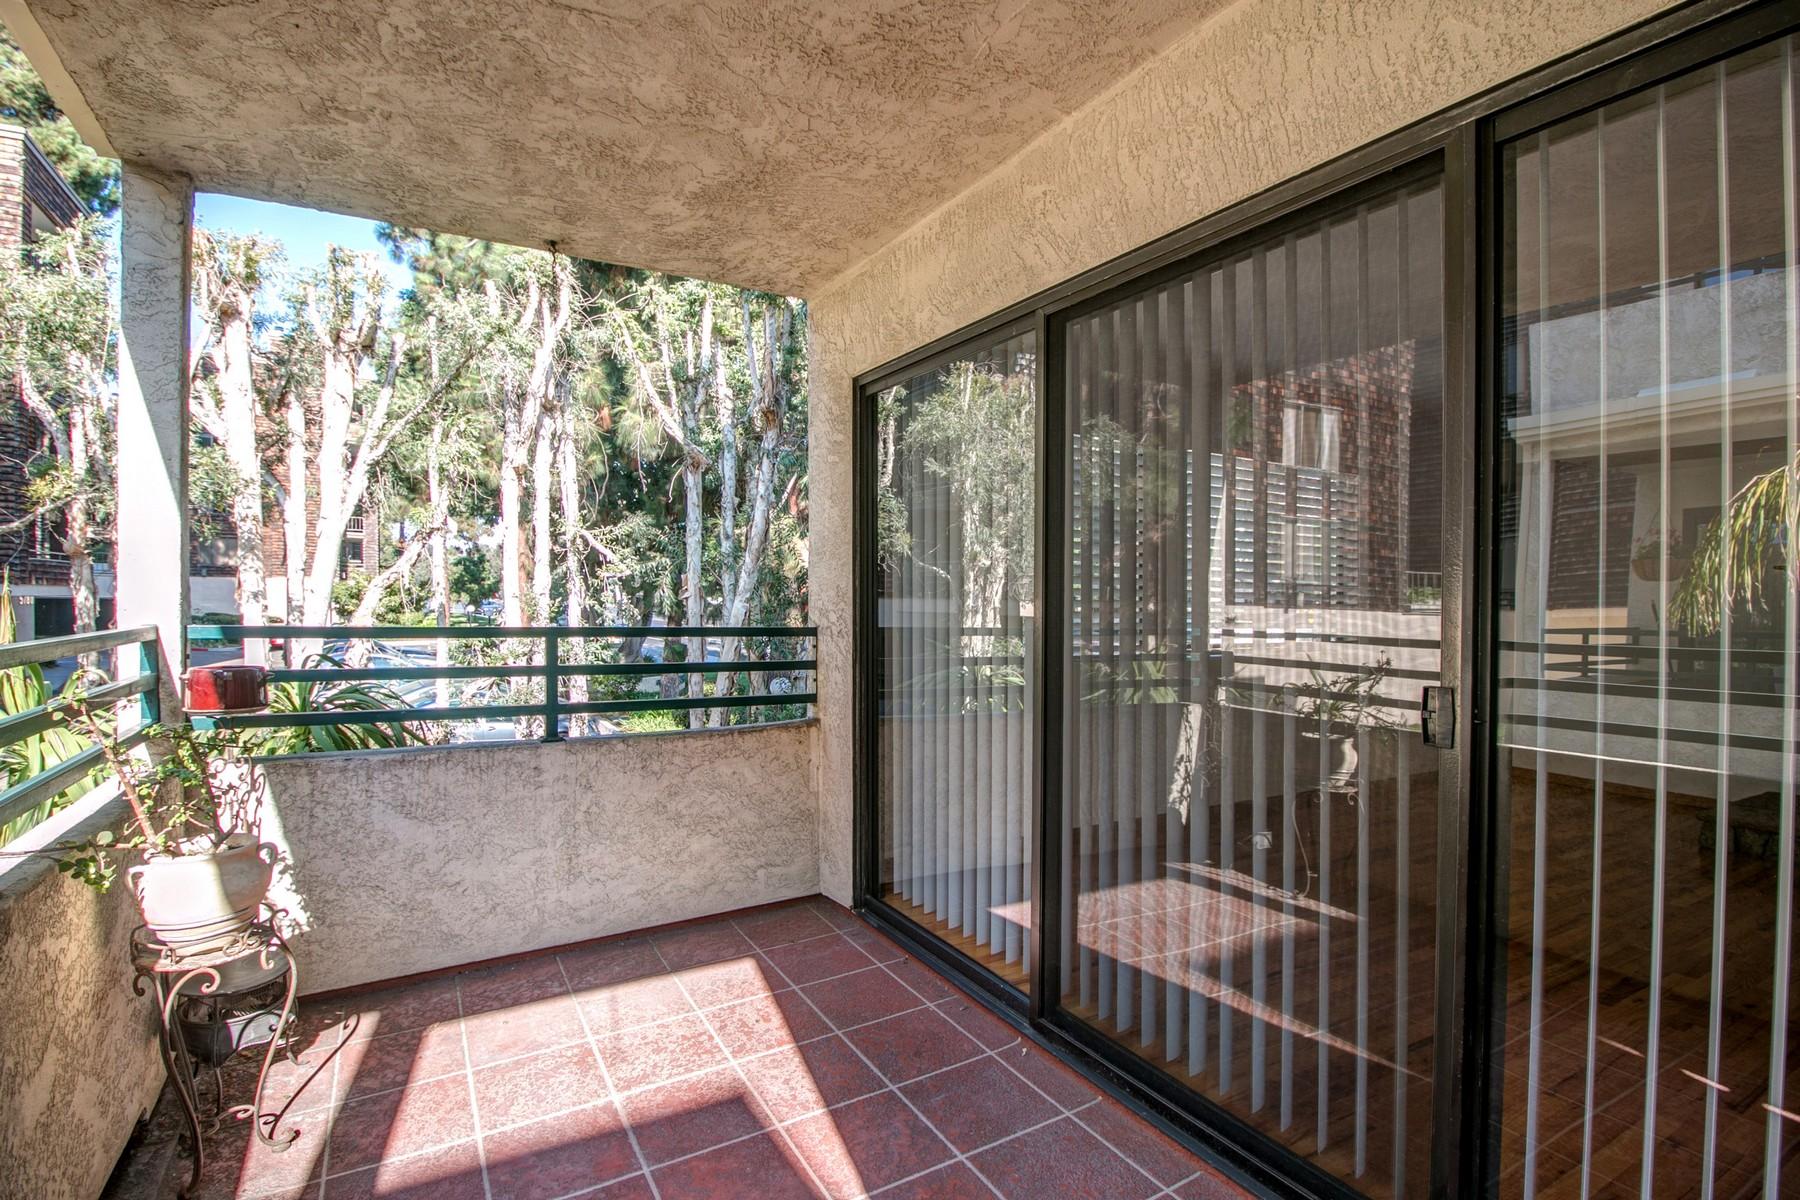 Additional photo for property listing at 1055 Donahue Street, Suite 7  San Diego, Калифорния 92110 Соединенные Штаты